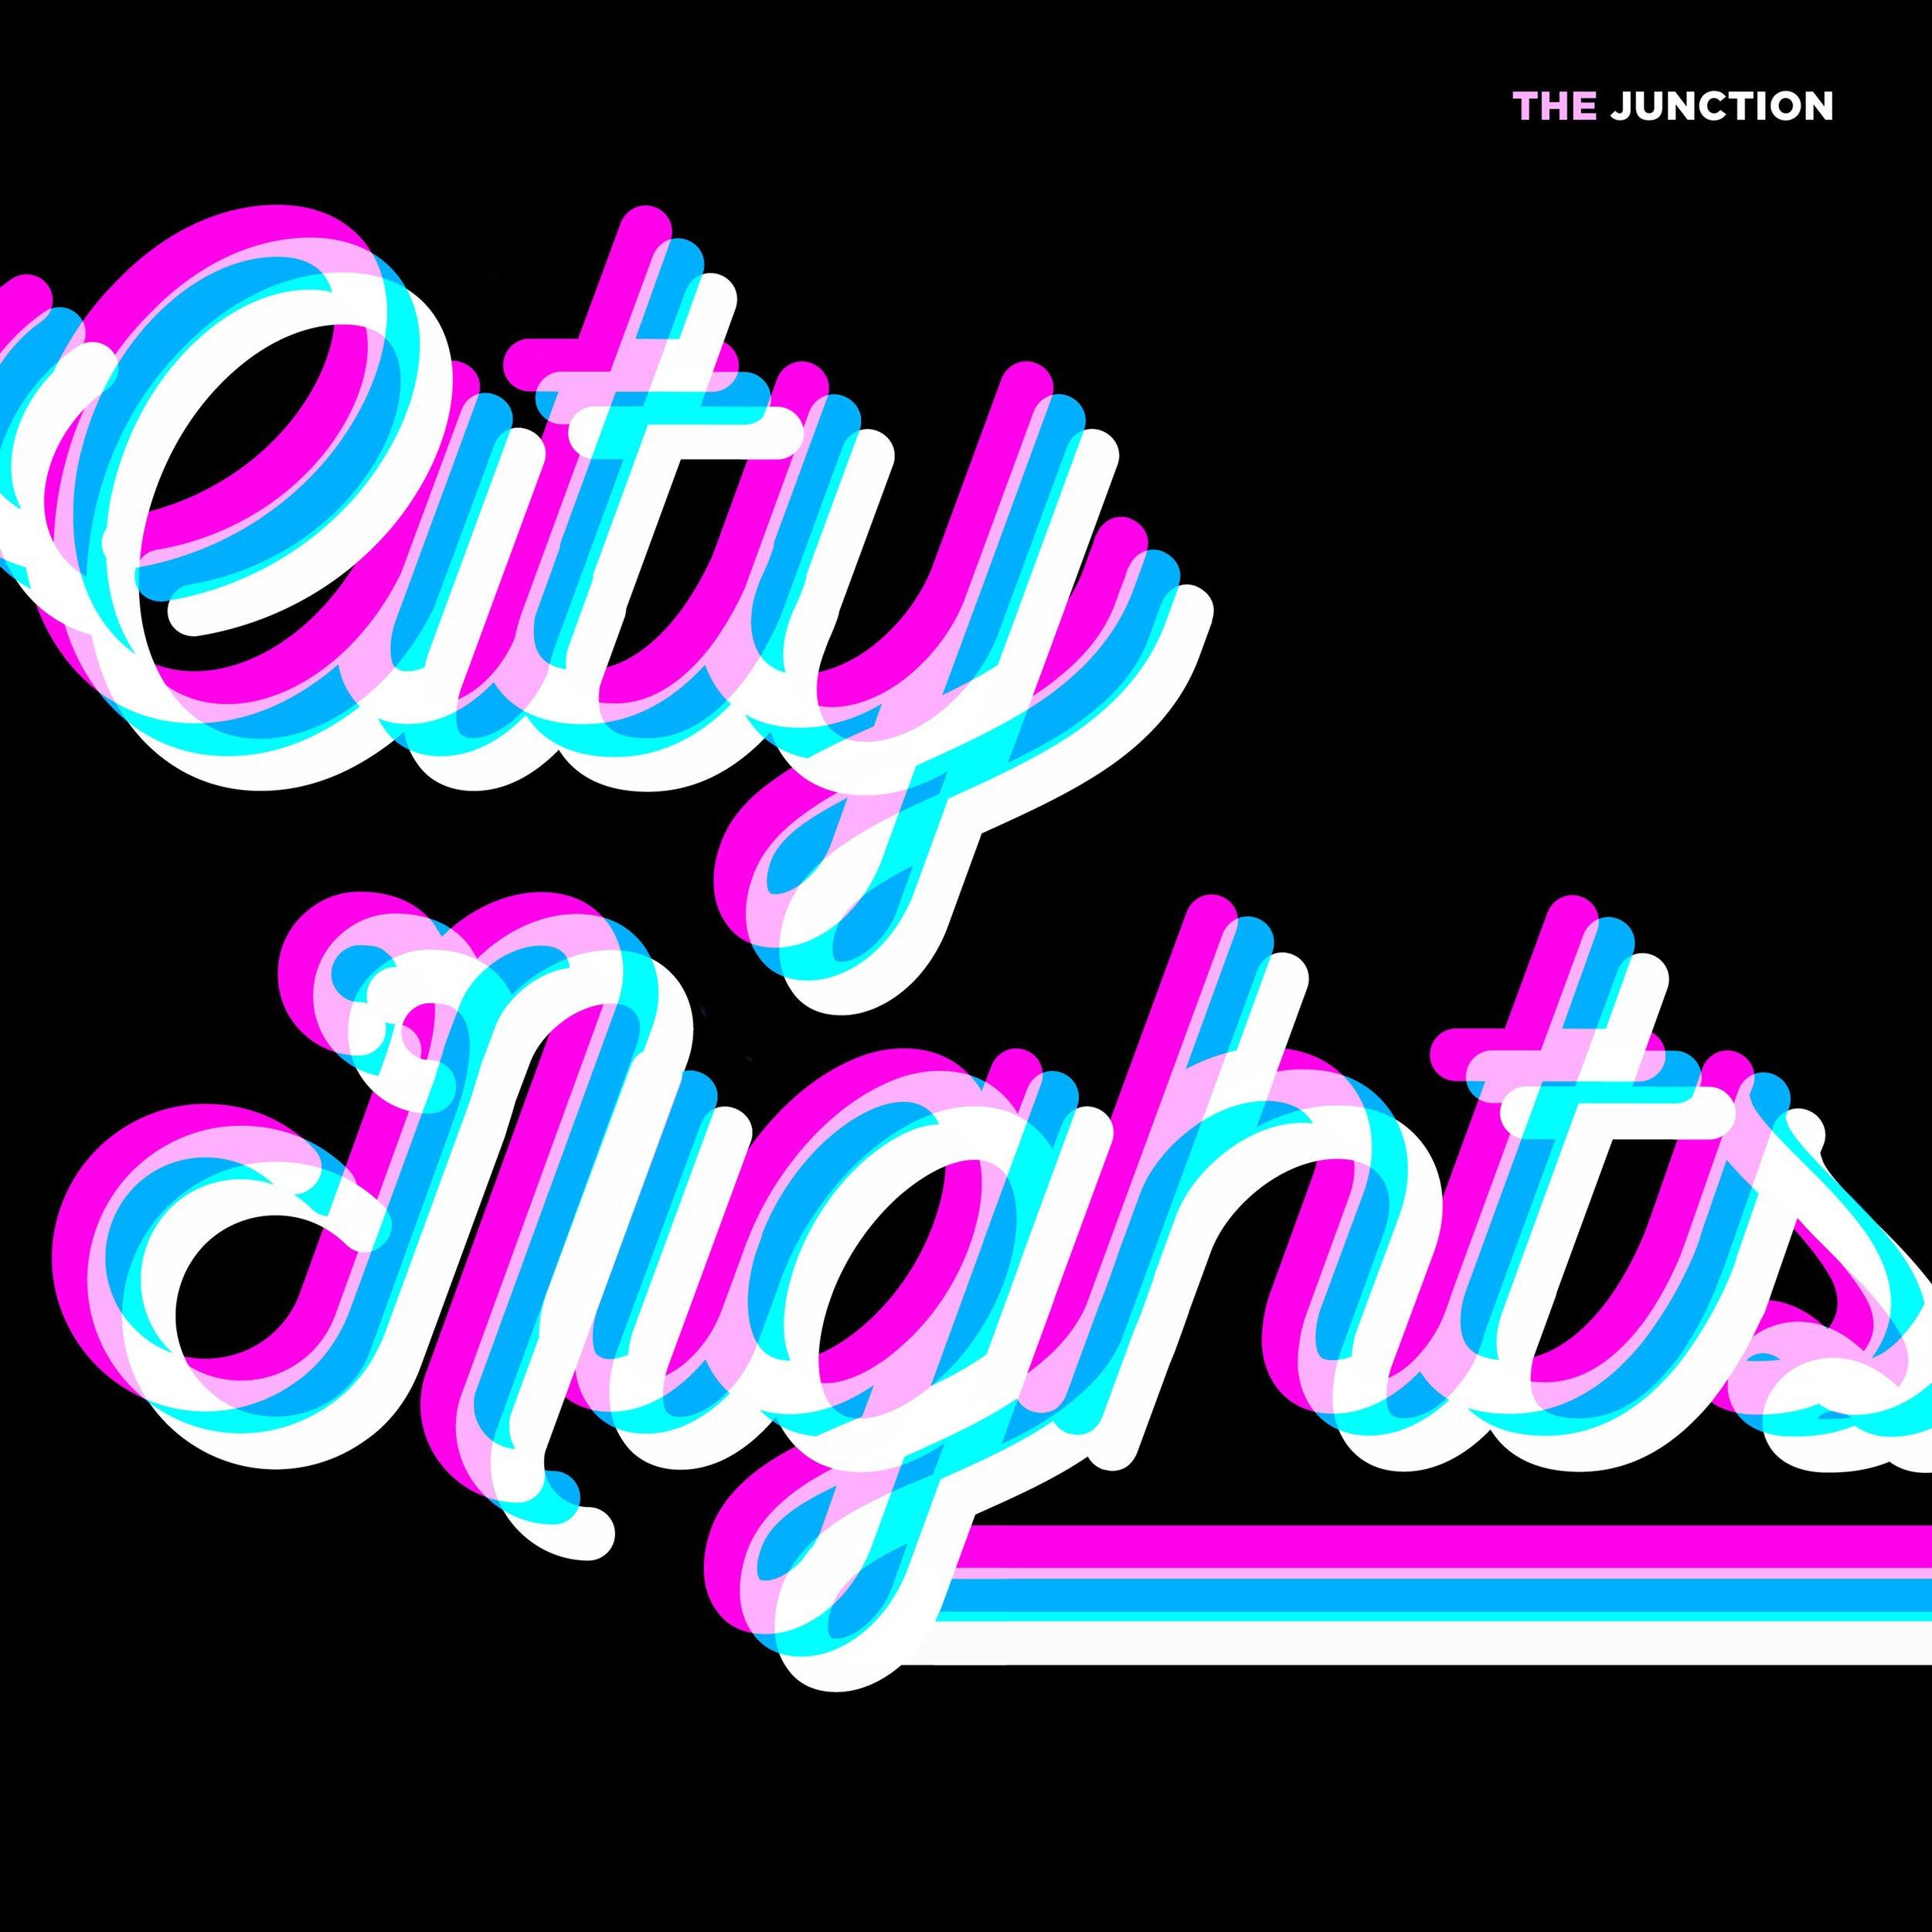 TheJunction CityNights Single 3000x3000 F.jpeg